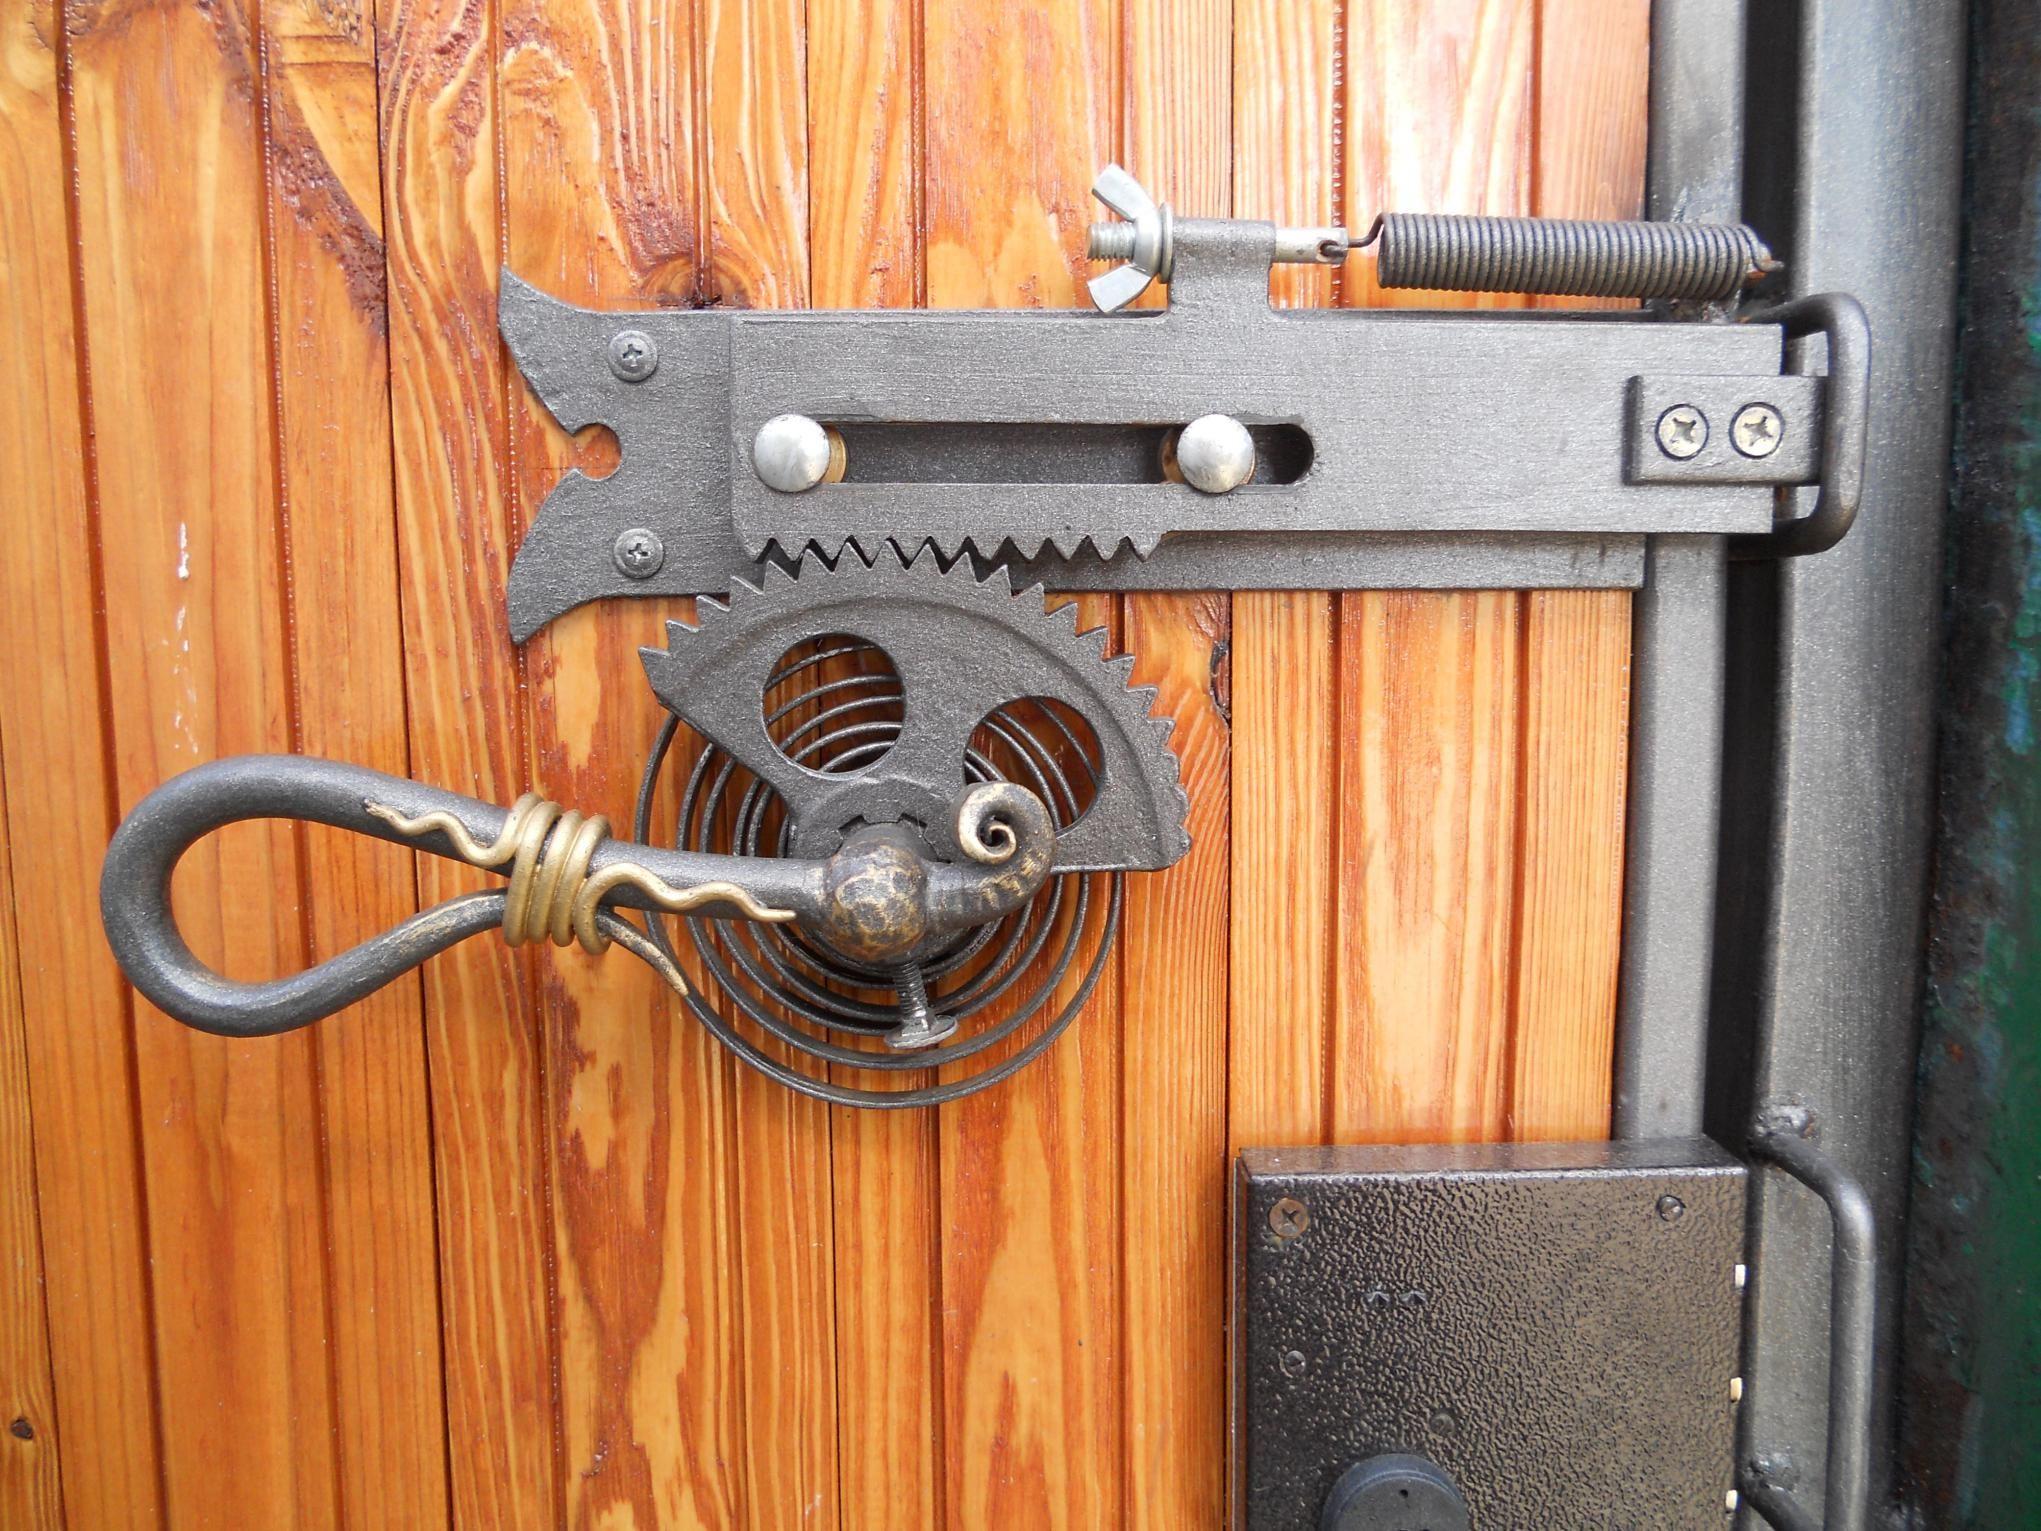 cool door locks. cool looking gate latch door locks m